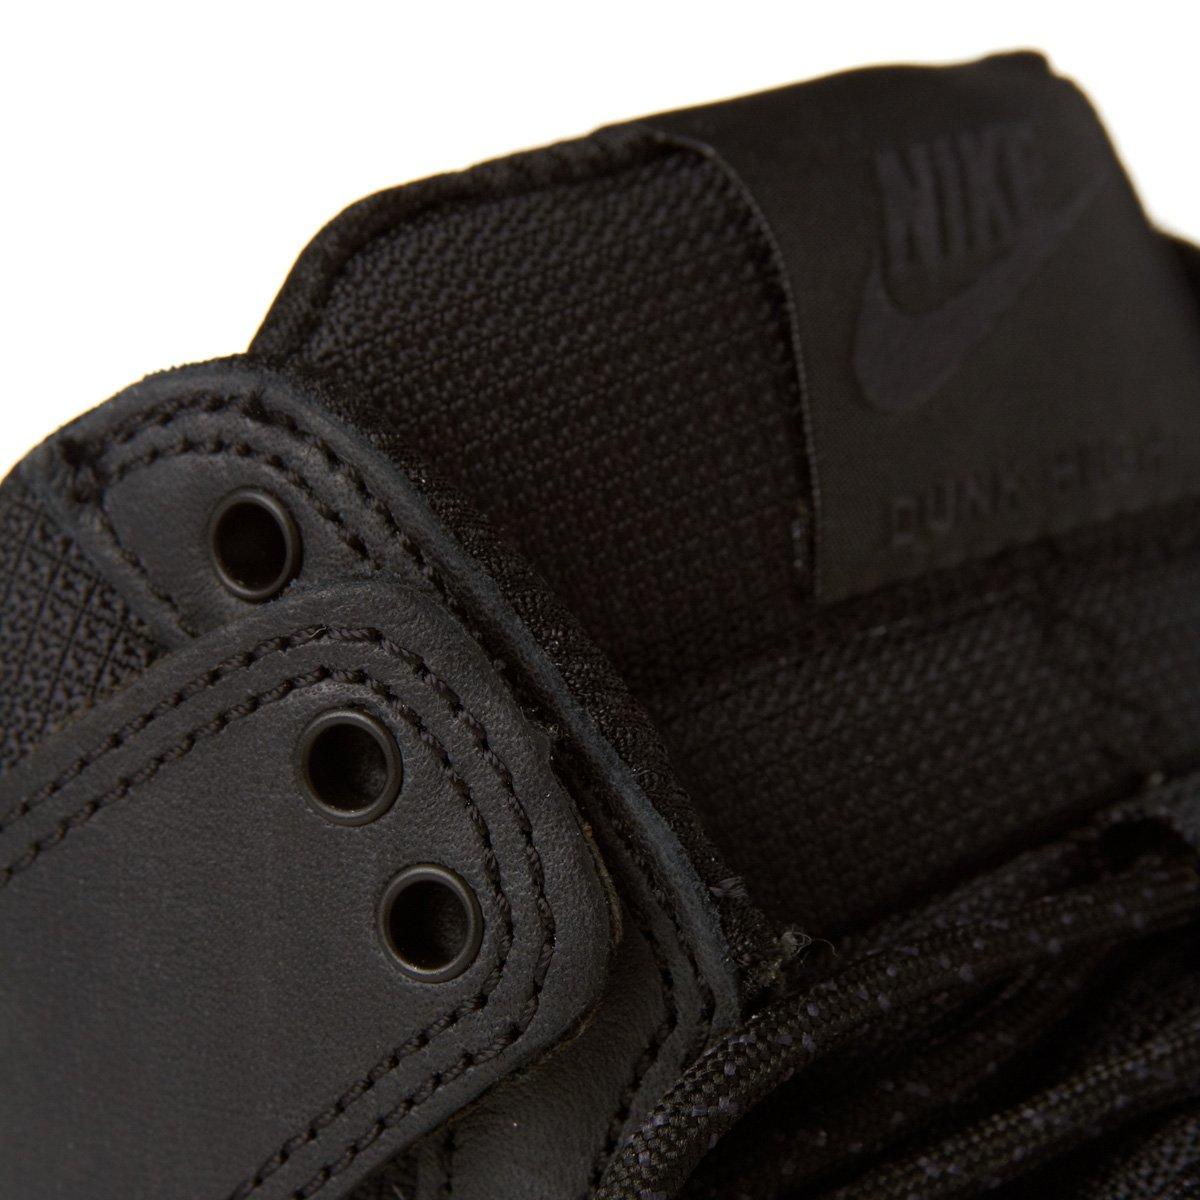 Nike SB Dunk High avvio, Scarpe da Skateboard Skateboard Skateboard Uomo B009J3H6LK 45 EU Nero | Ben Noto Per Le Sue Belle Qualità  | Di Alta Qualità  | Per Vincere Elogio Caldo Dai Clienti  | Modalità moderna  | Eleganti  | On Line  7f00a5